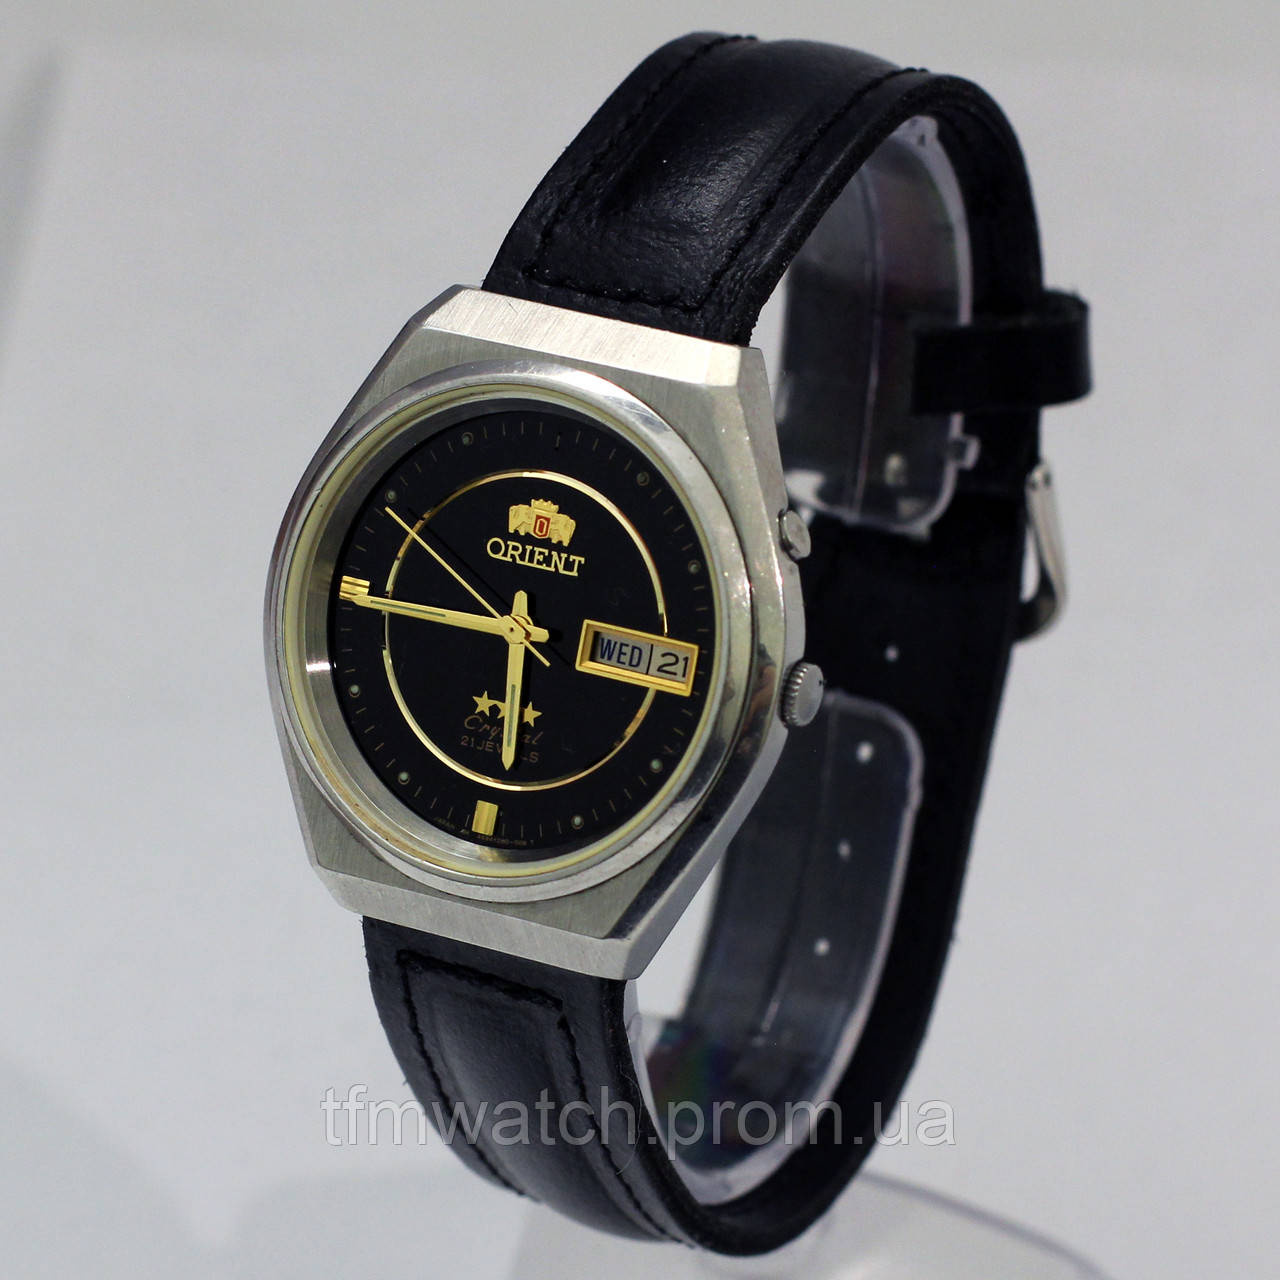 Ориент 3 звезды мужские часы